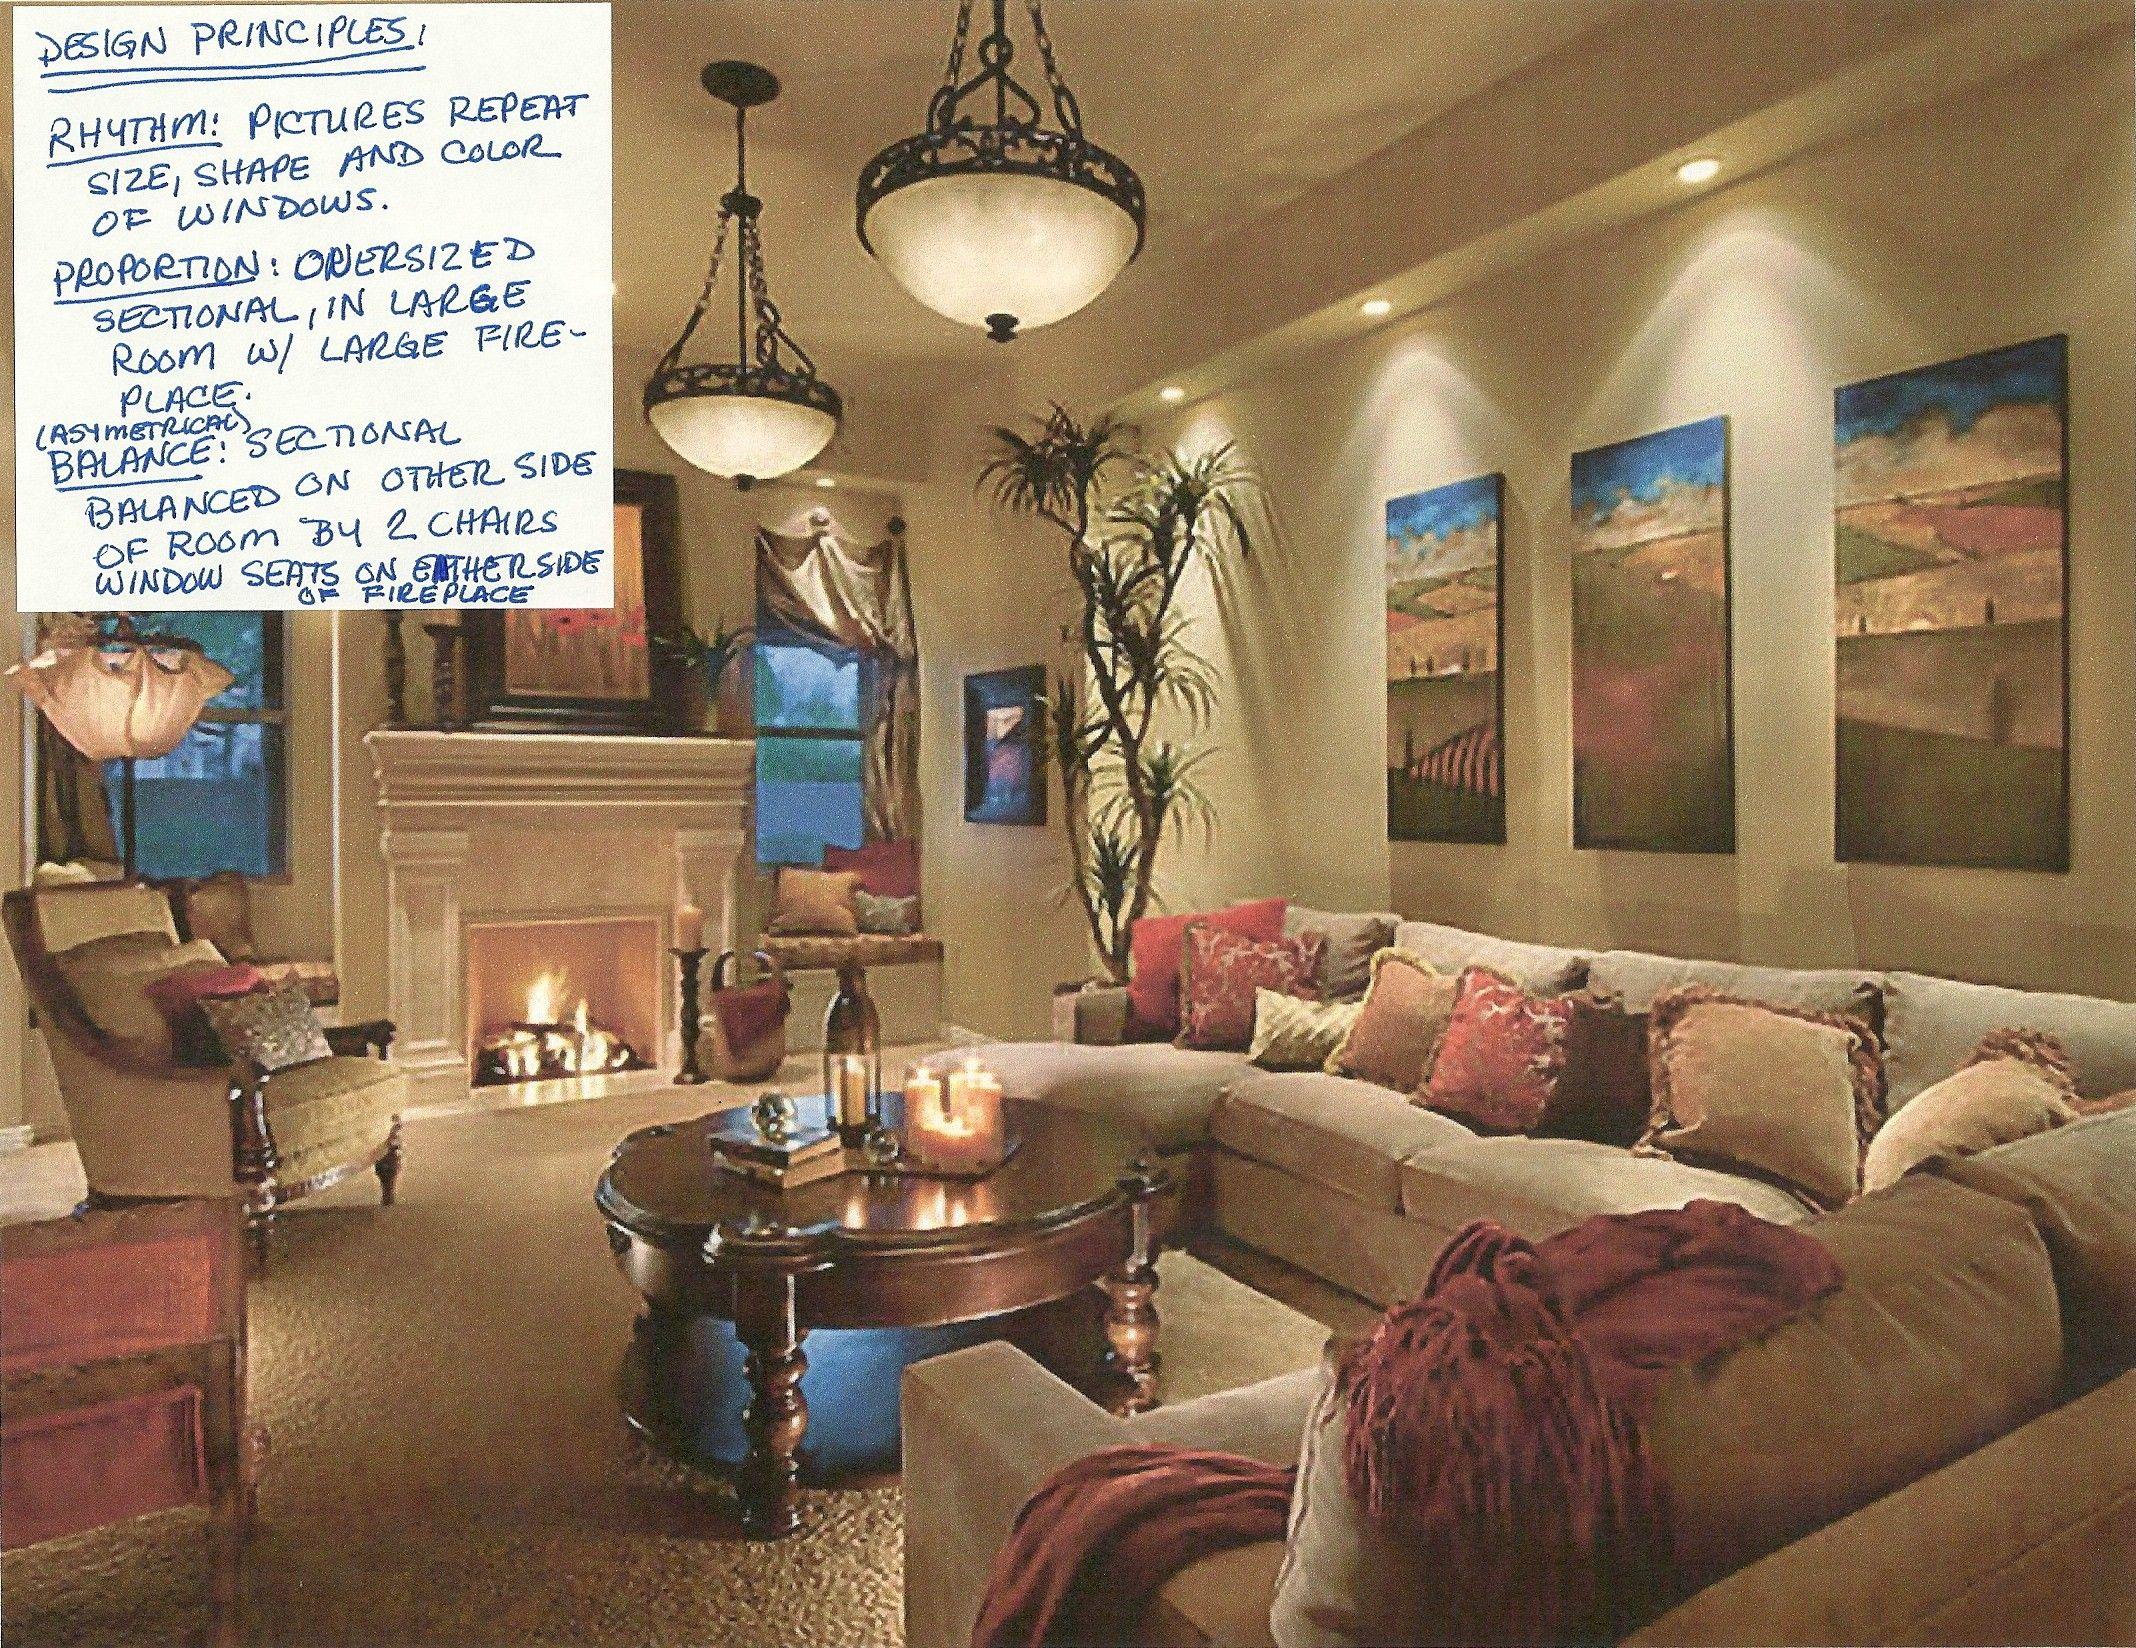 Principles Of Design Rhythm Proportion Asymetrical Balance Dark Living Rooms Living Room Lighting Tips Living Room Lighting